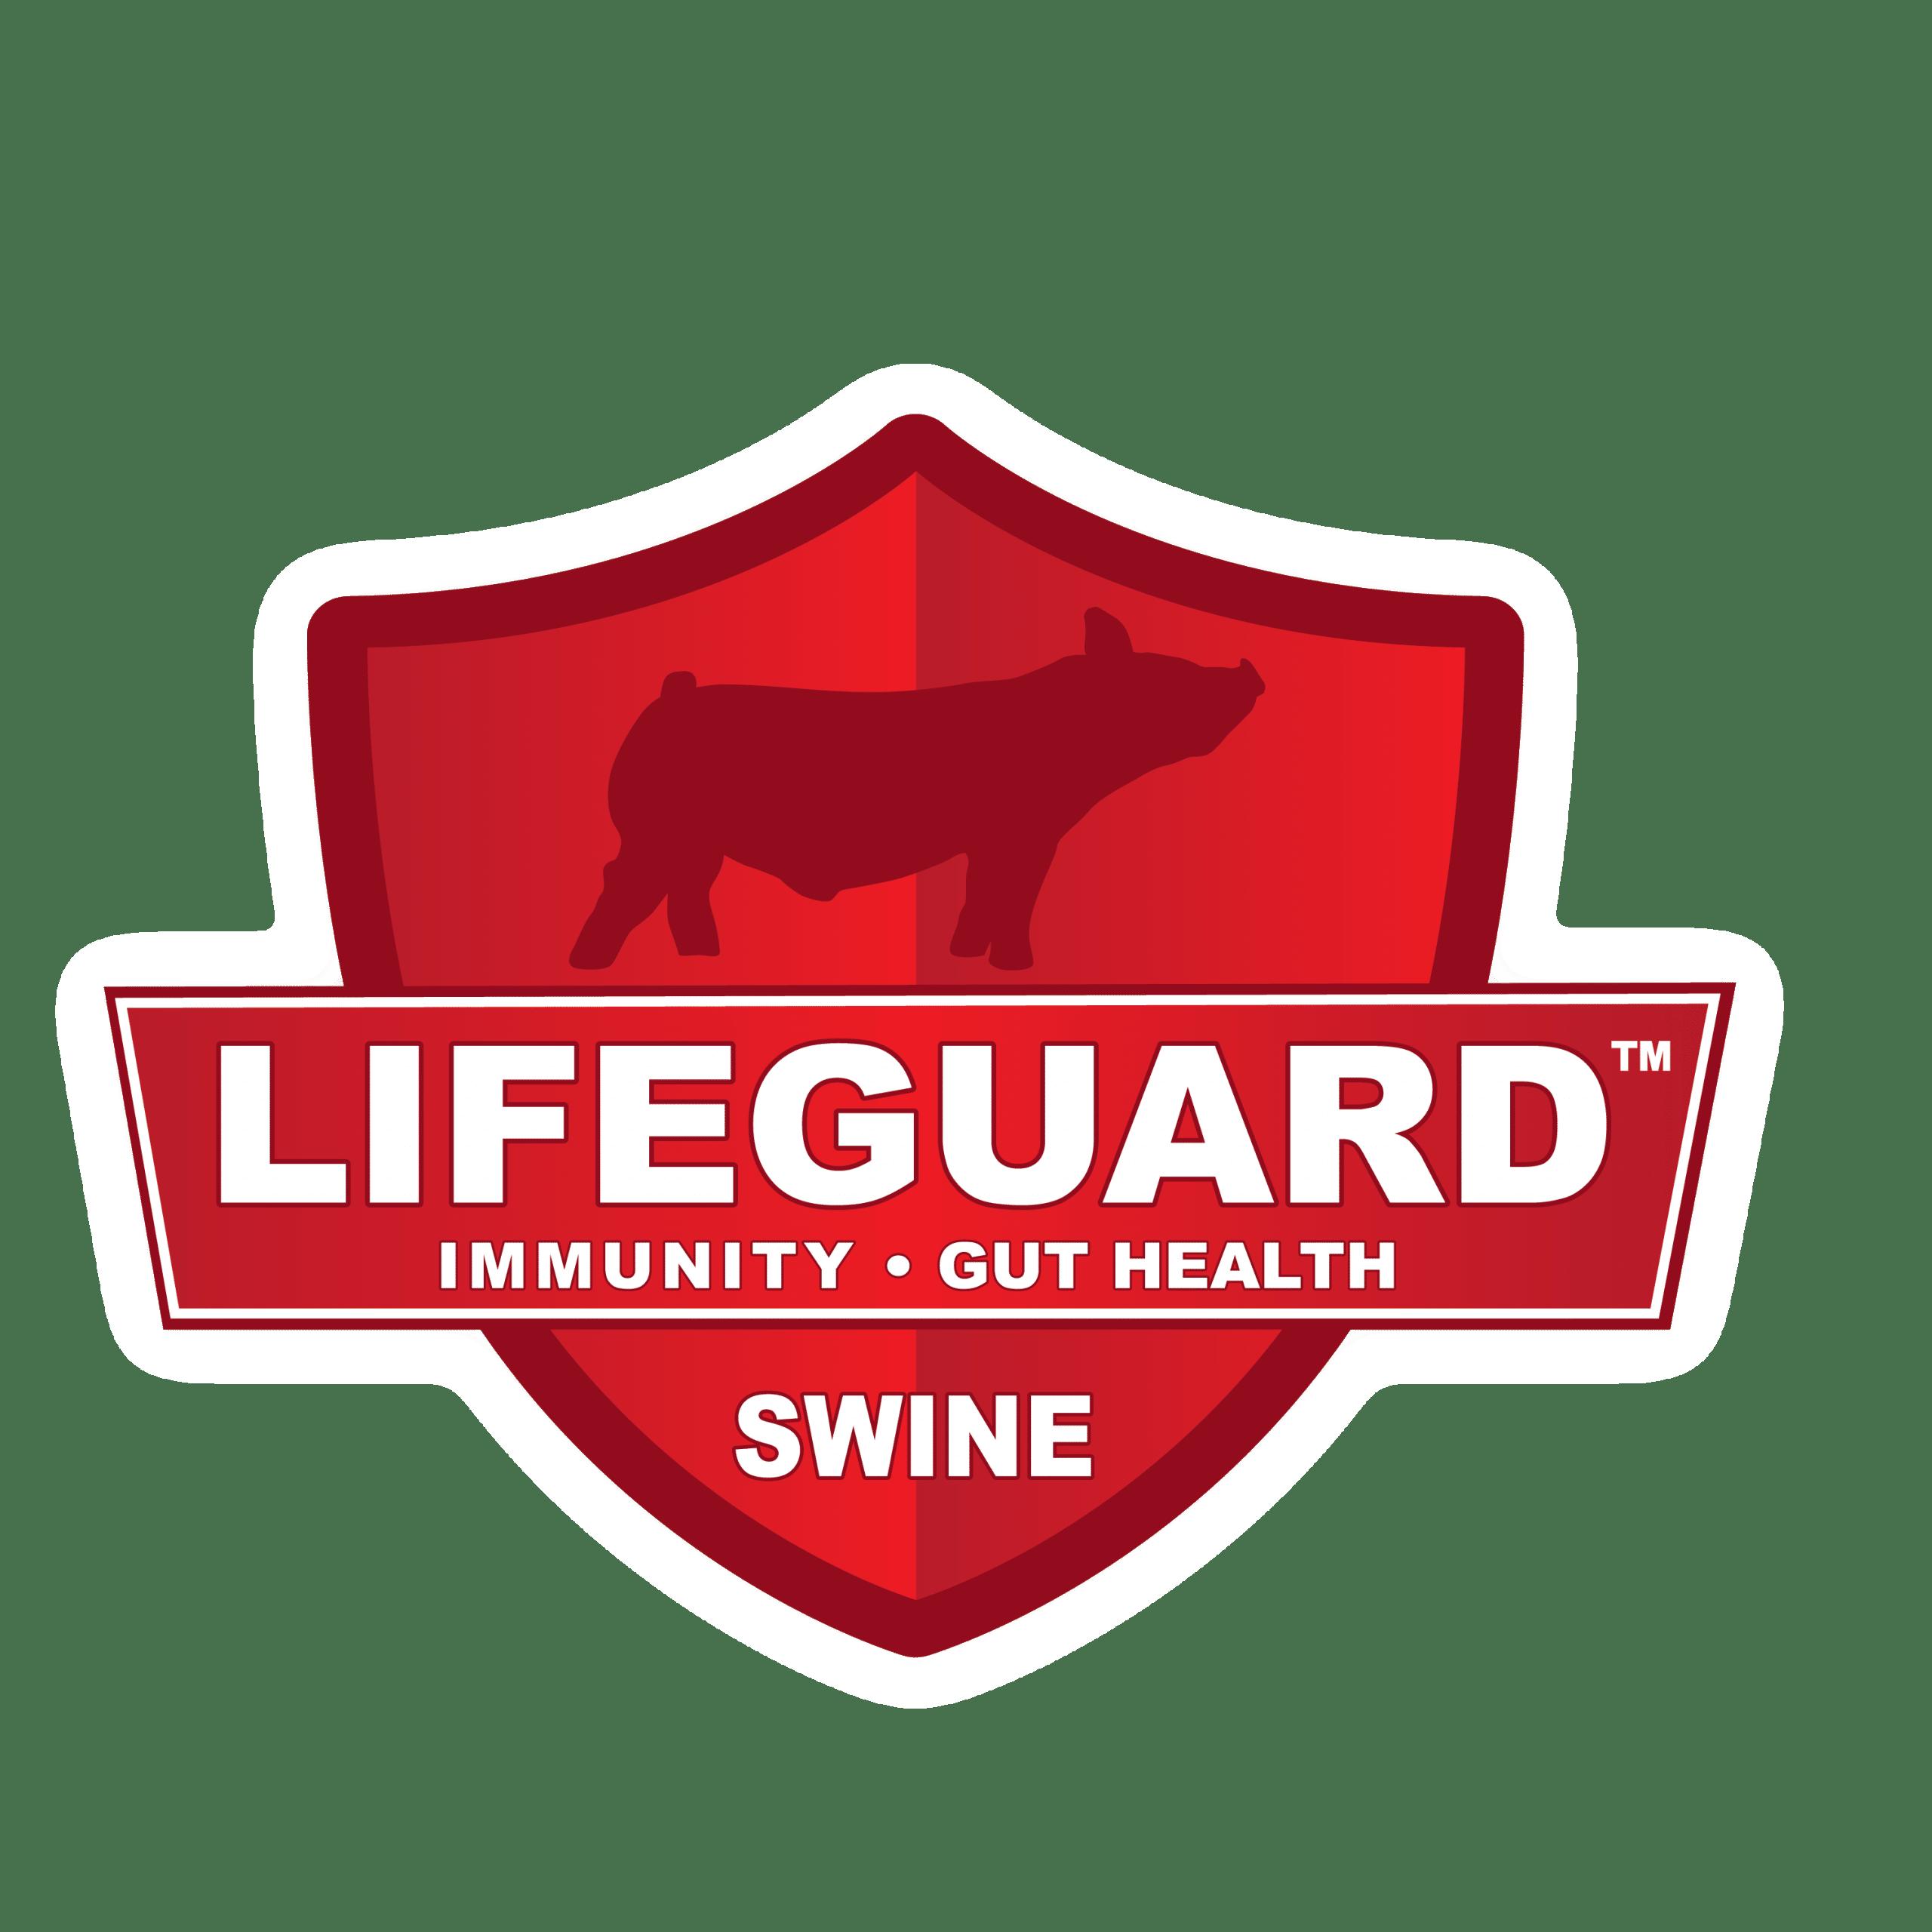 Swine Lifeguard